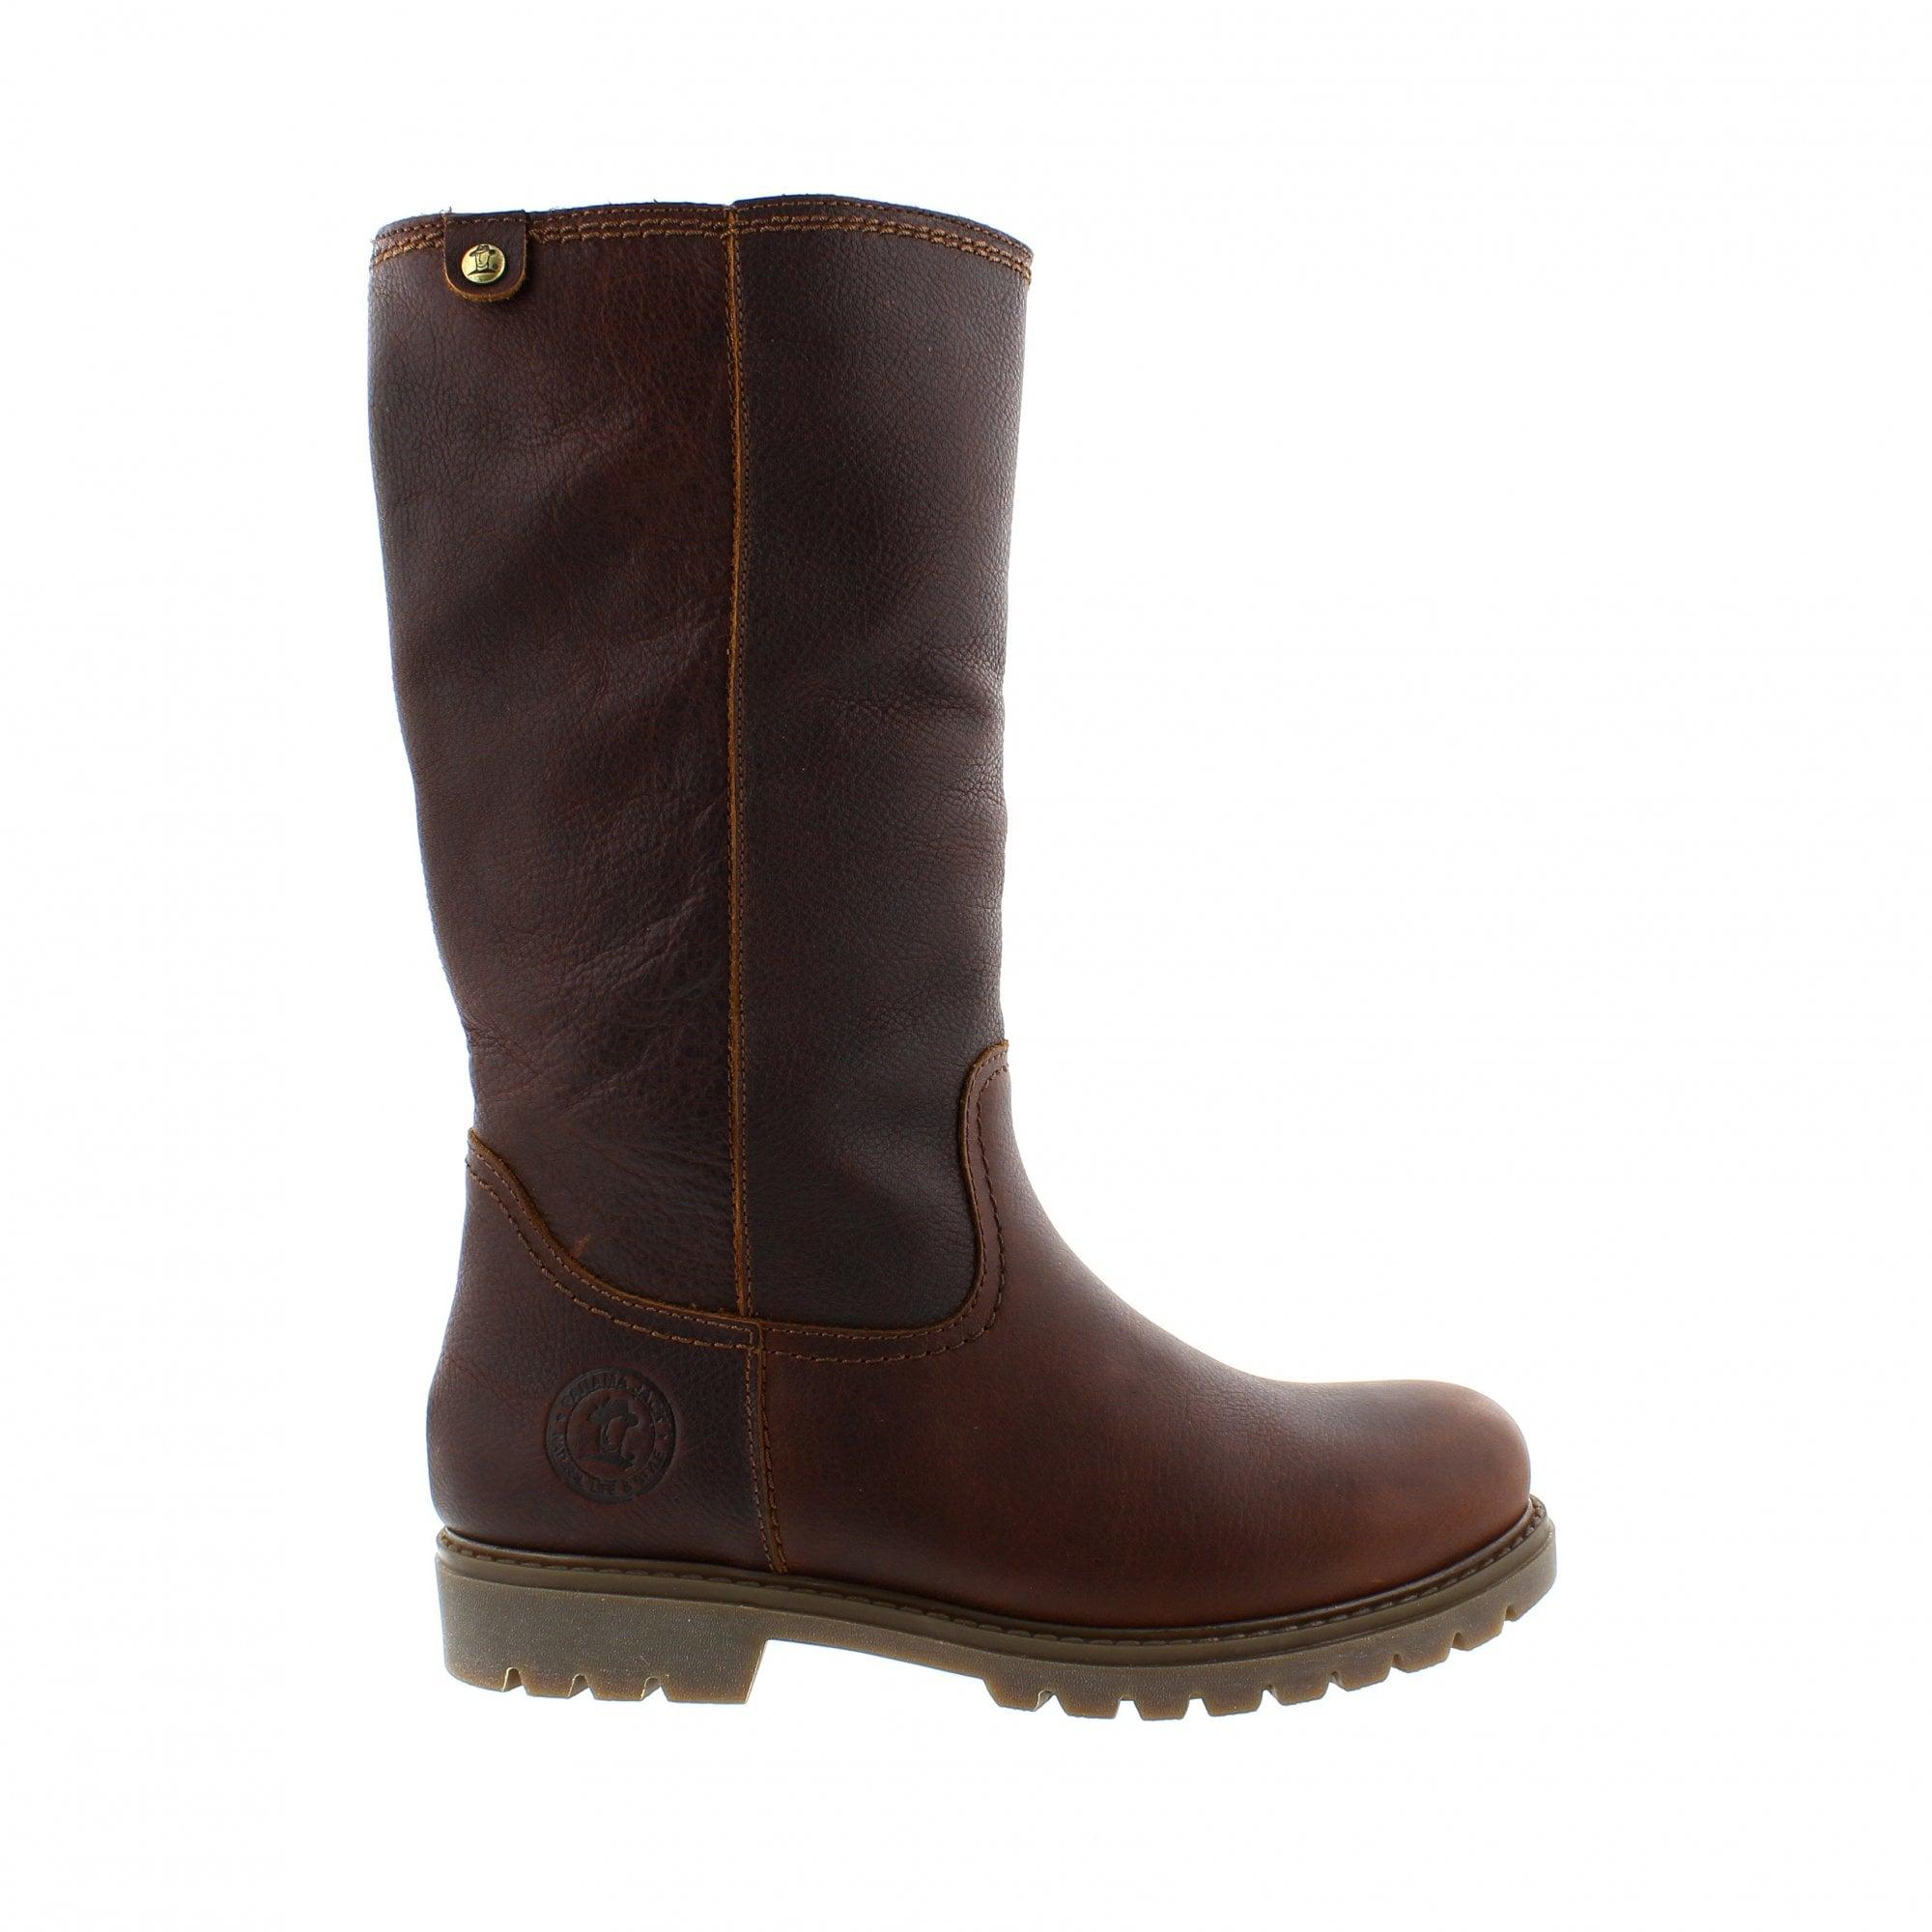 2c3bded6d0f44 Panama Jack Bambina Igloo B18 Napa Grass Womens Boots